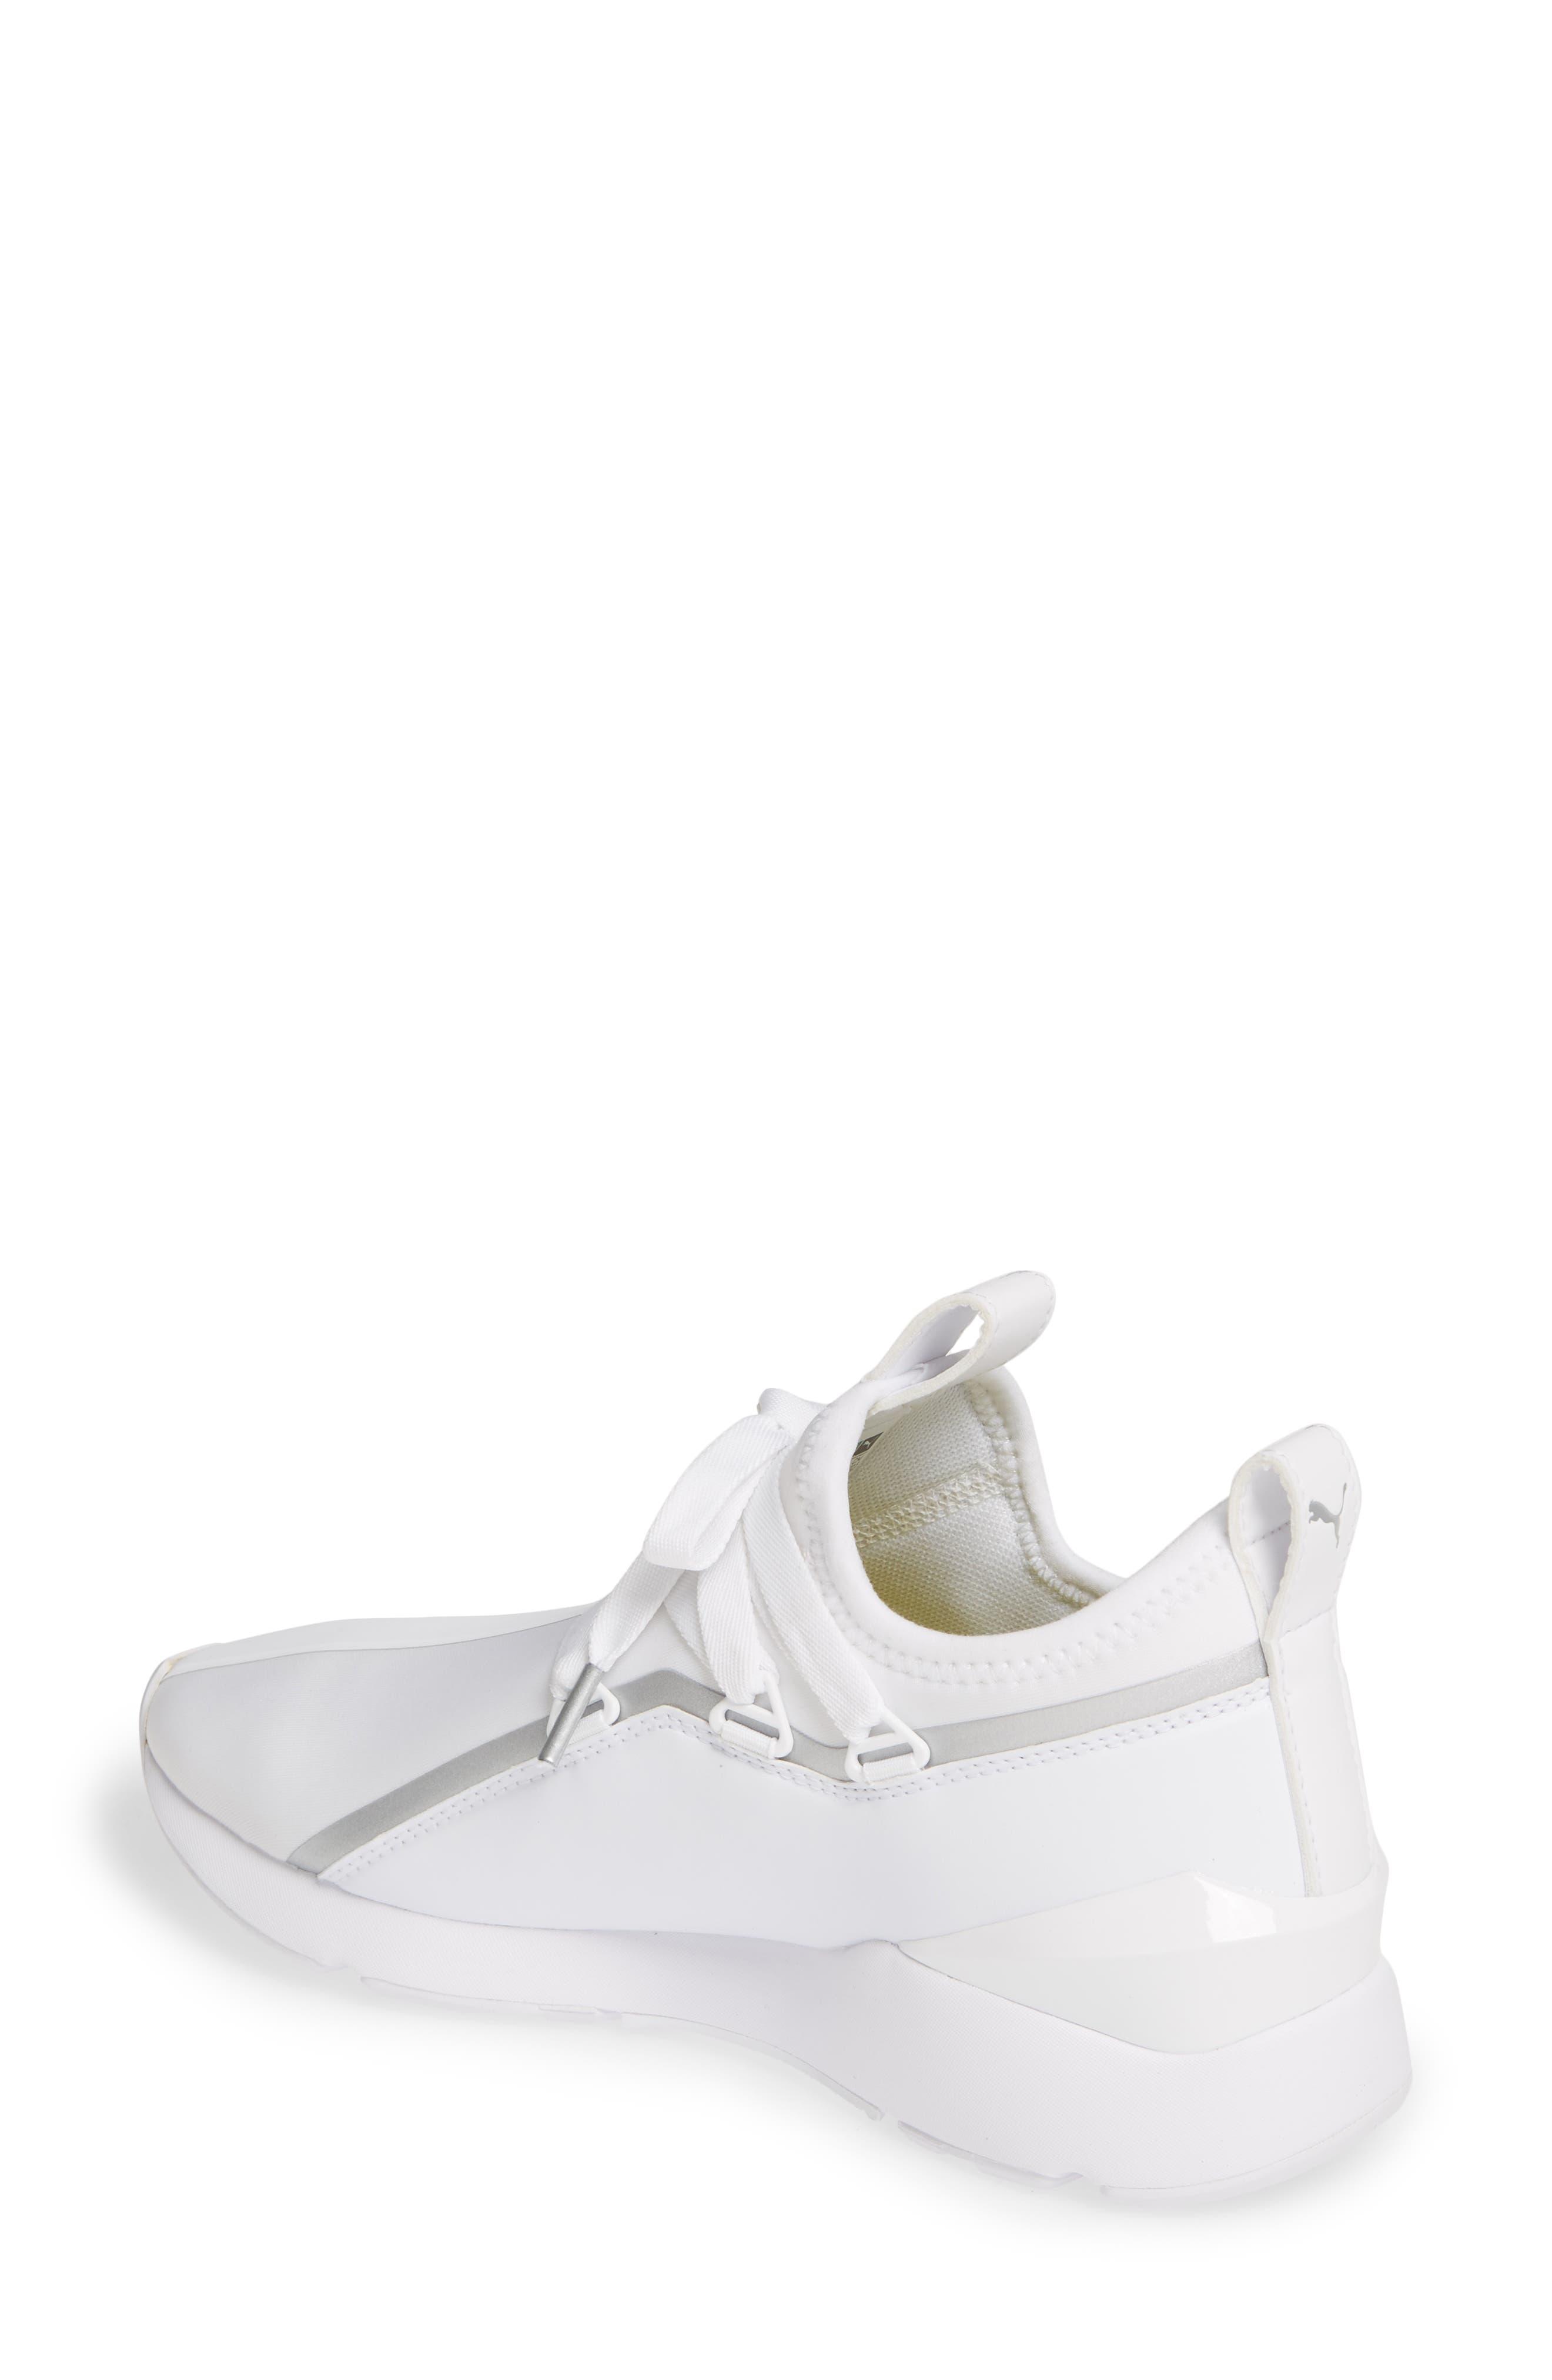 PUMA, Muse 2 Trailblazer Sneaker, Alternate thumbnail 2, color, WHITE/ SILVER